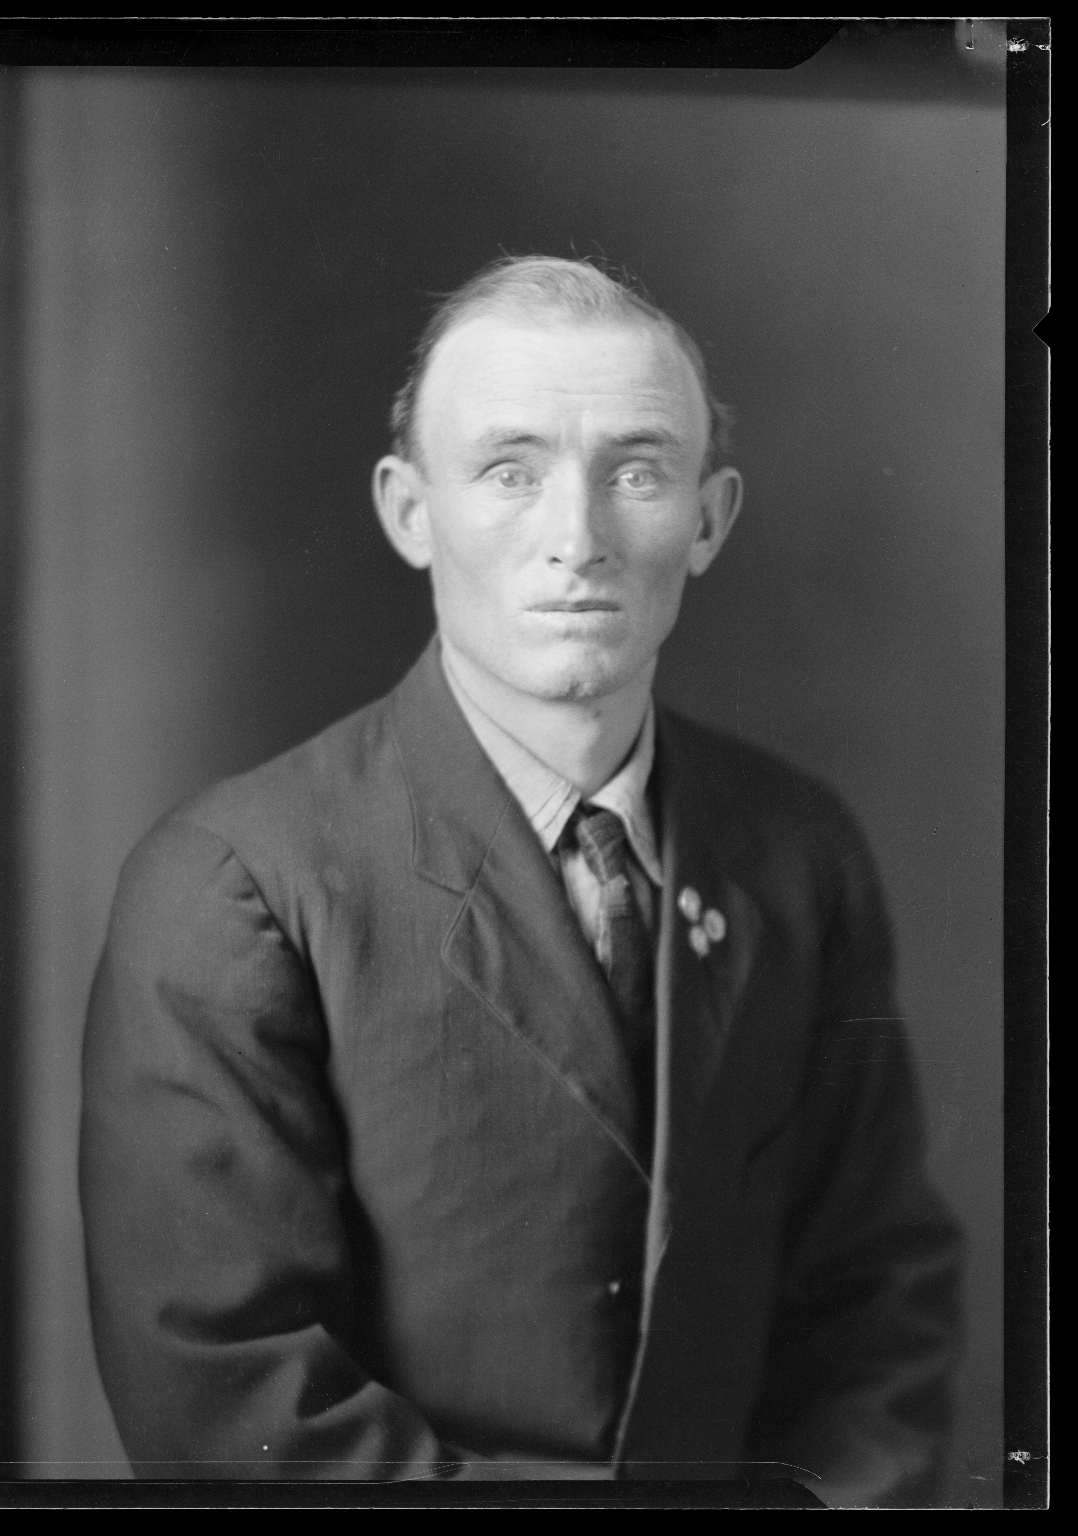 Portraits of George H. Roberts